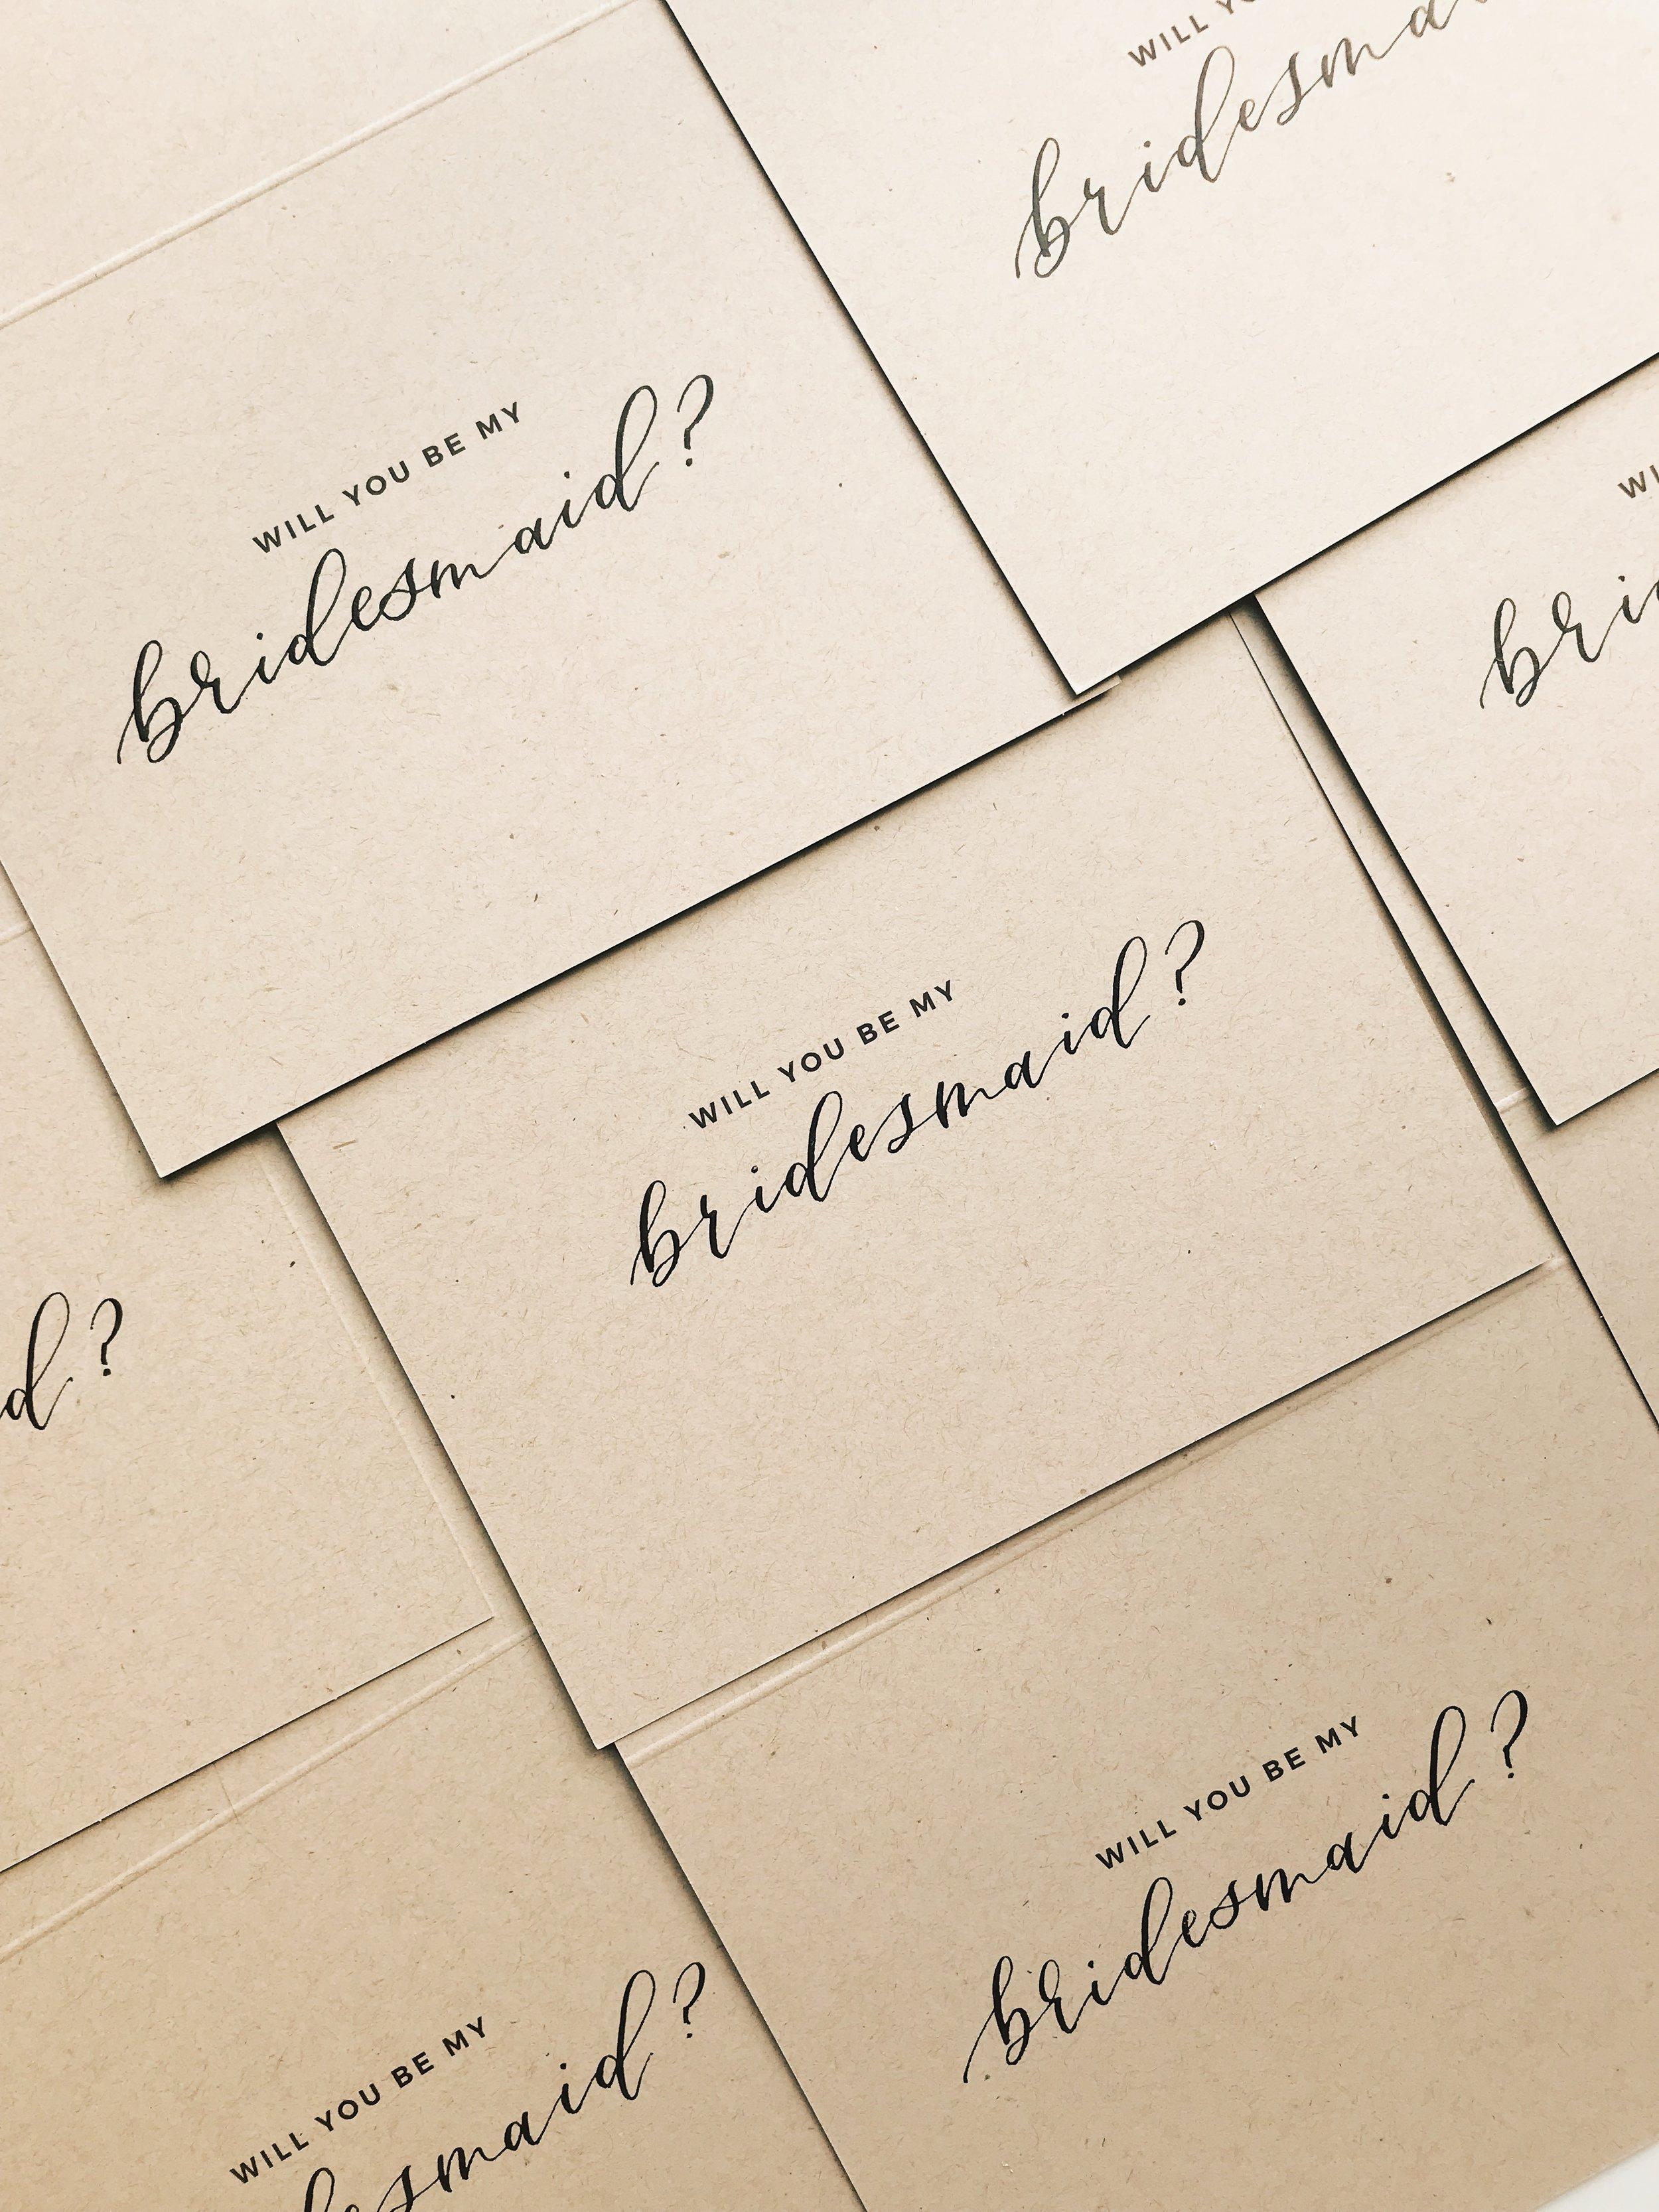 heylux_bridesmaids_calligraphy.JPG